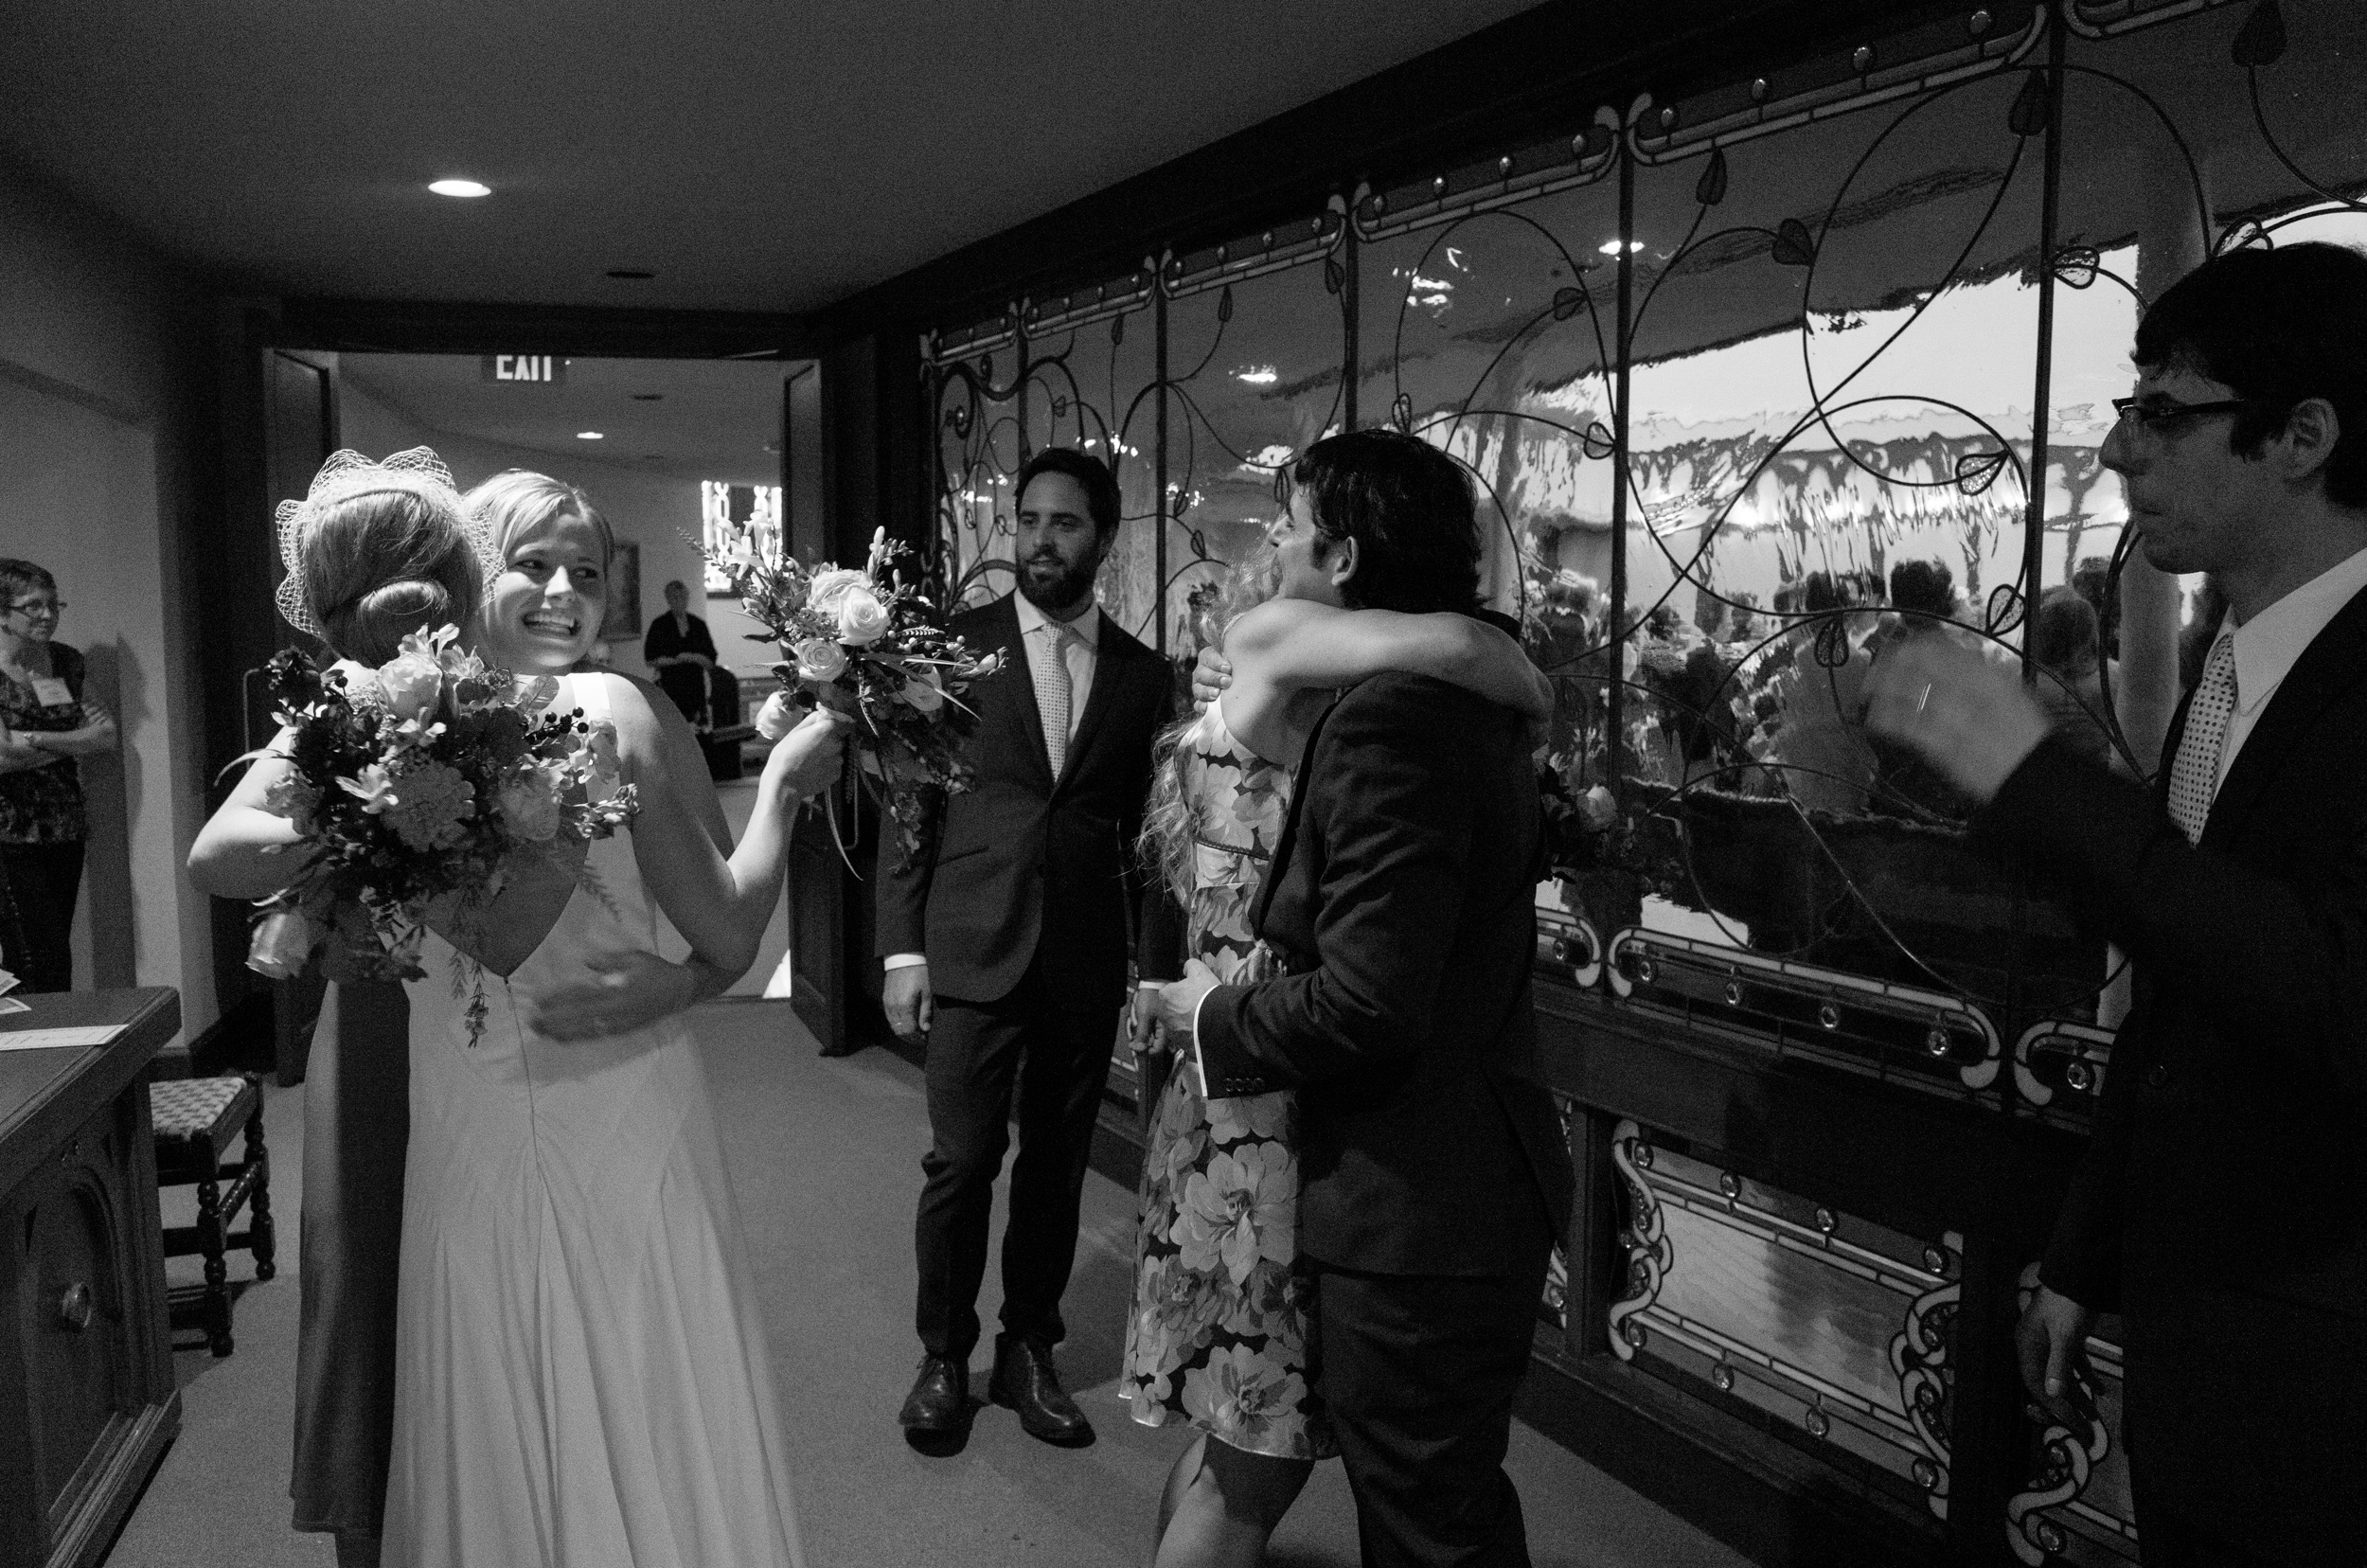 10-05-2013 maggie & adam wedding photography by brian milo-136.jpg